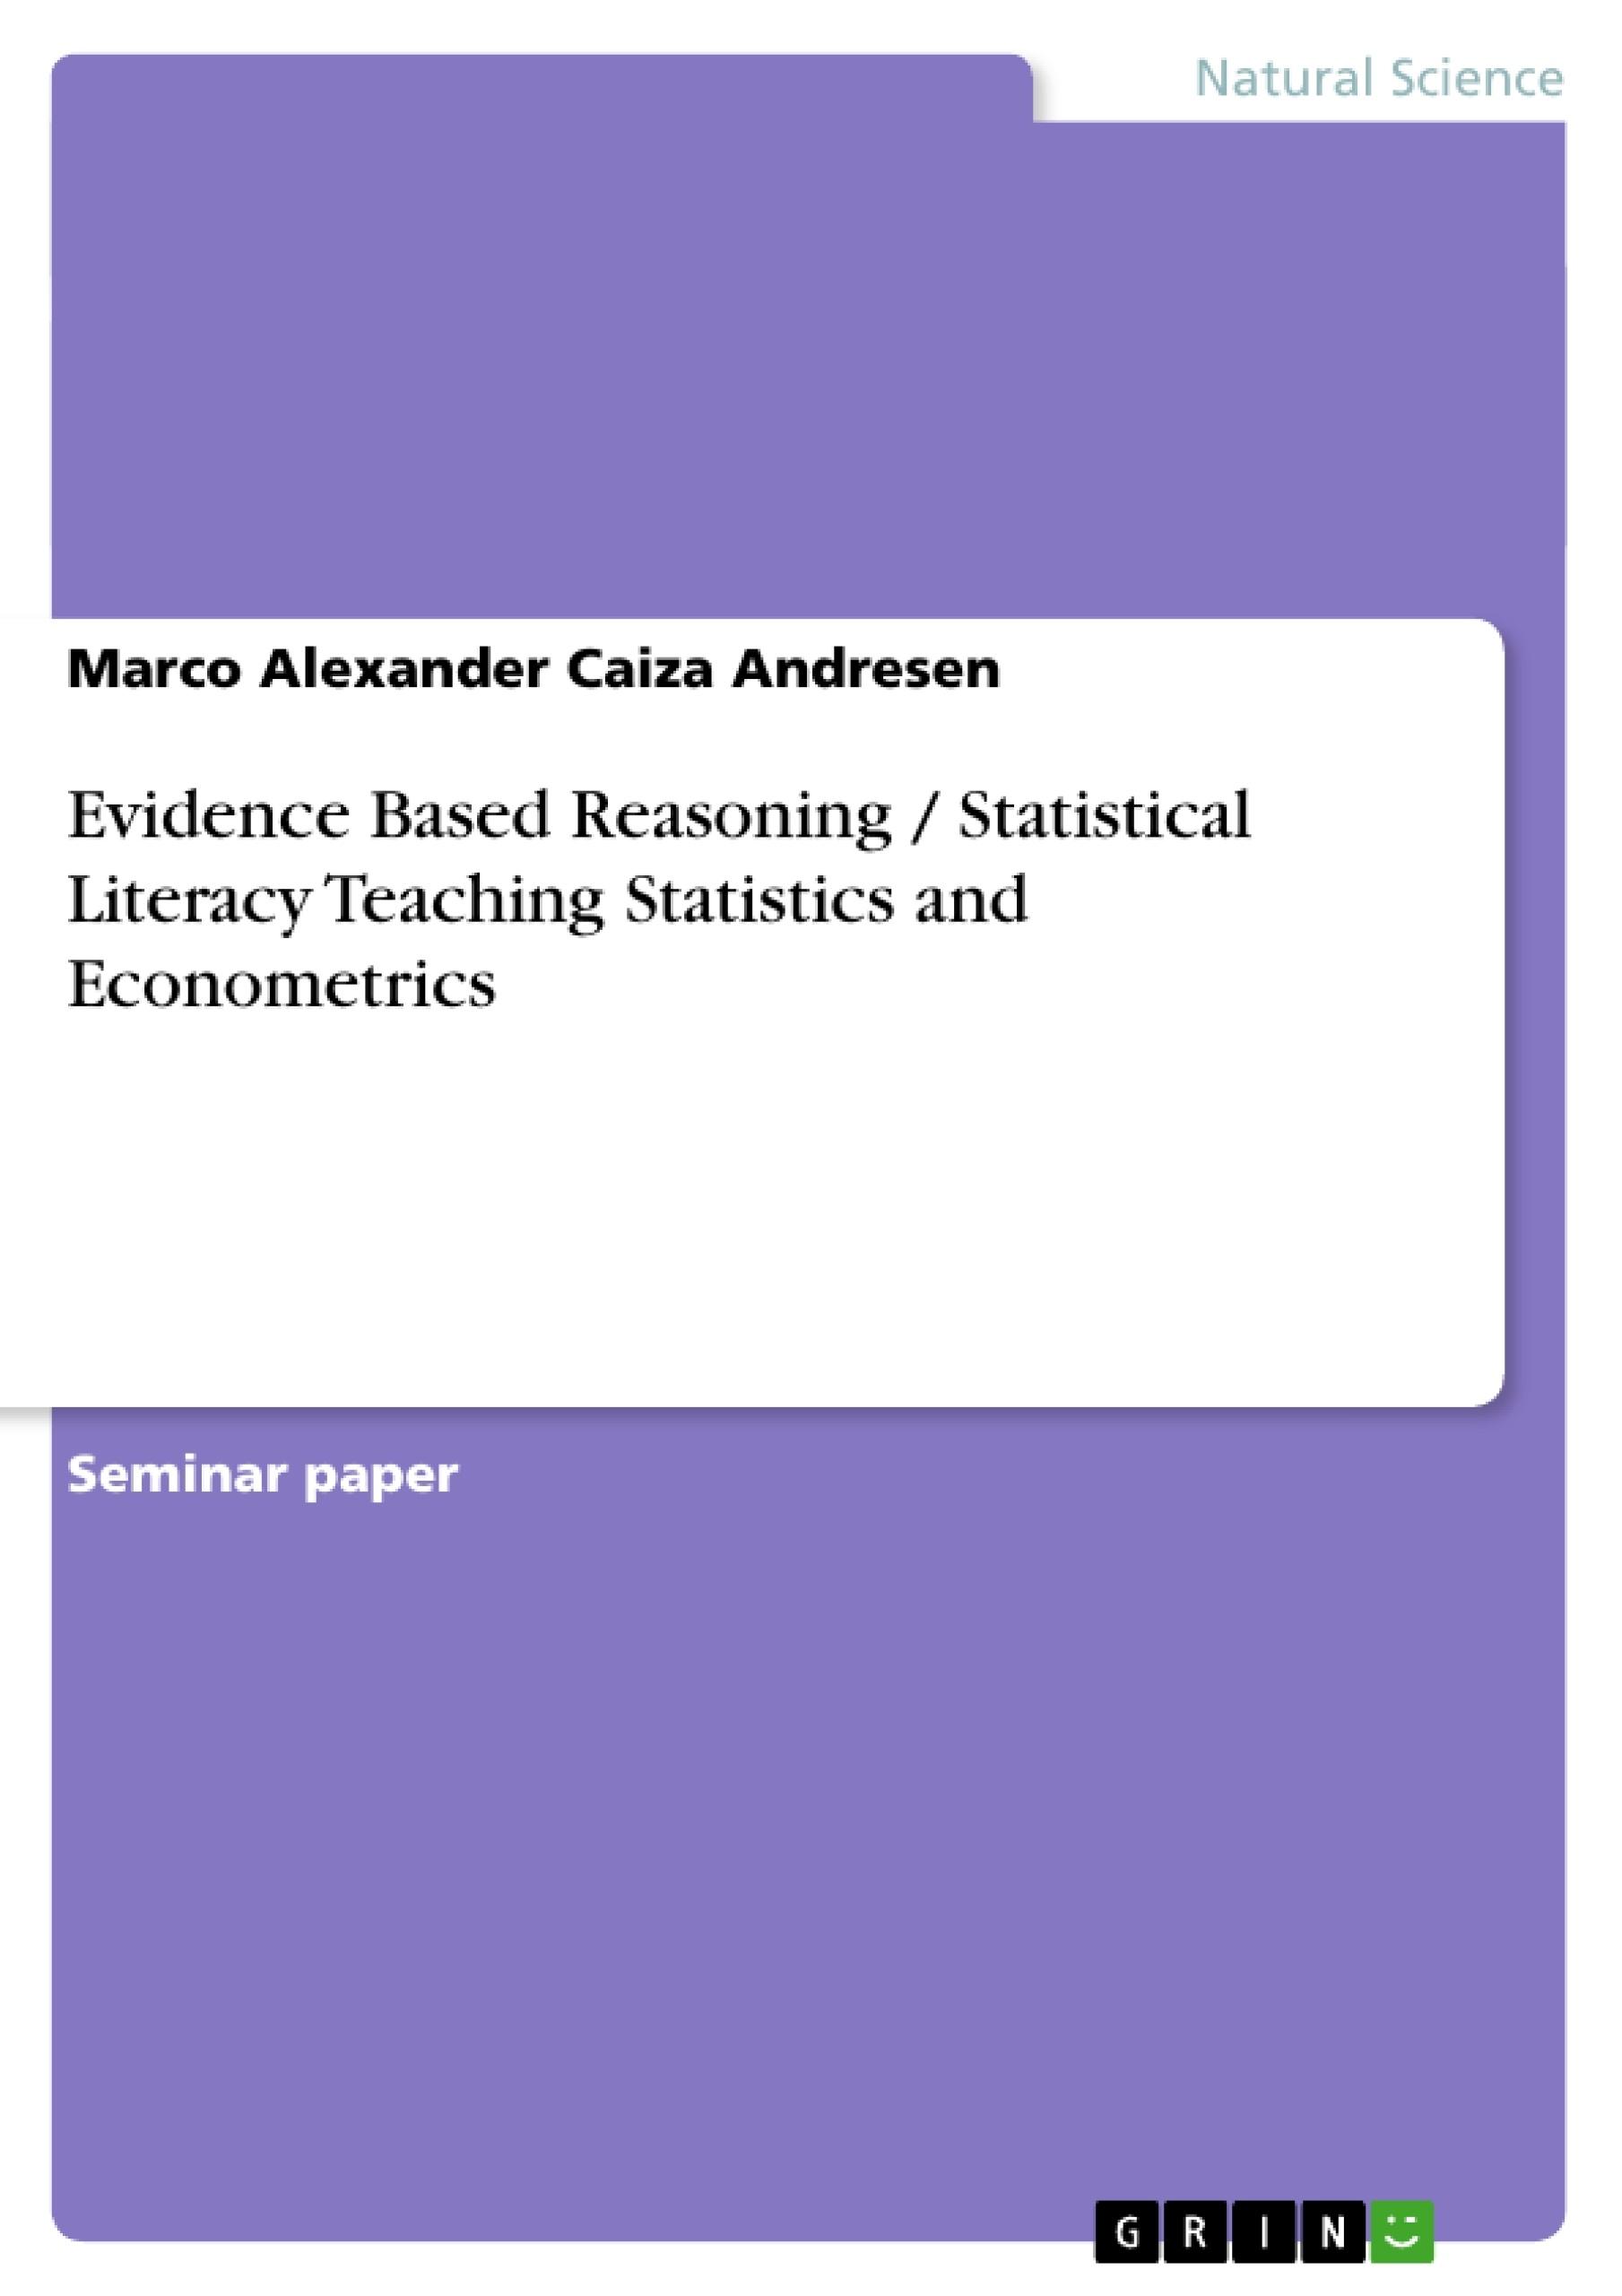 Title: Evidence Based Reasoning / Statistical Literacy Teaching Statistics and Econometrics